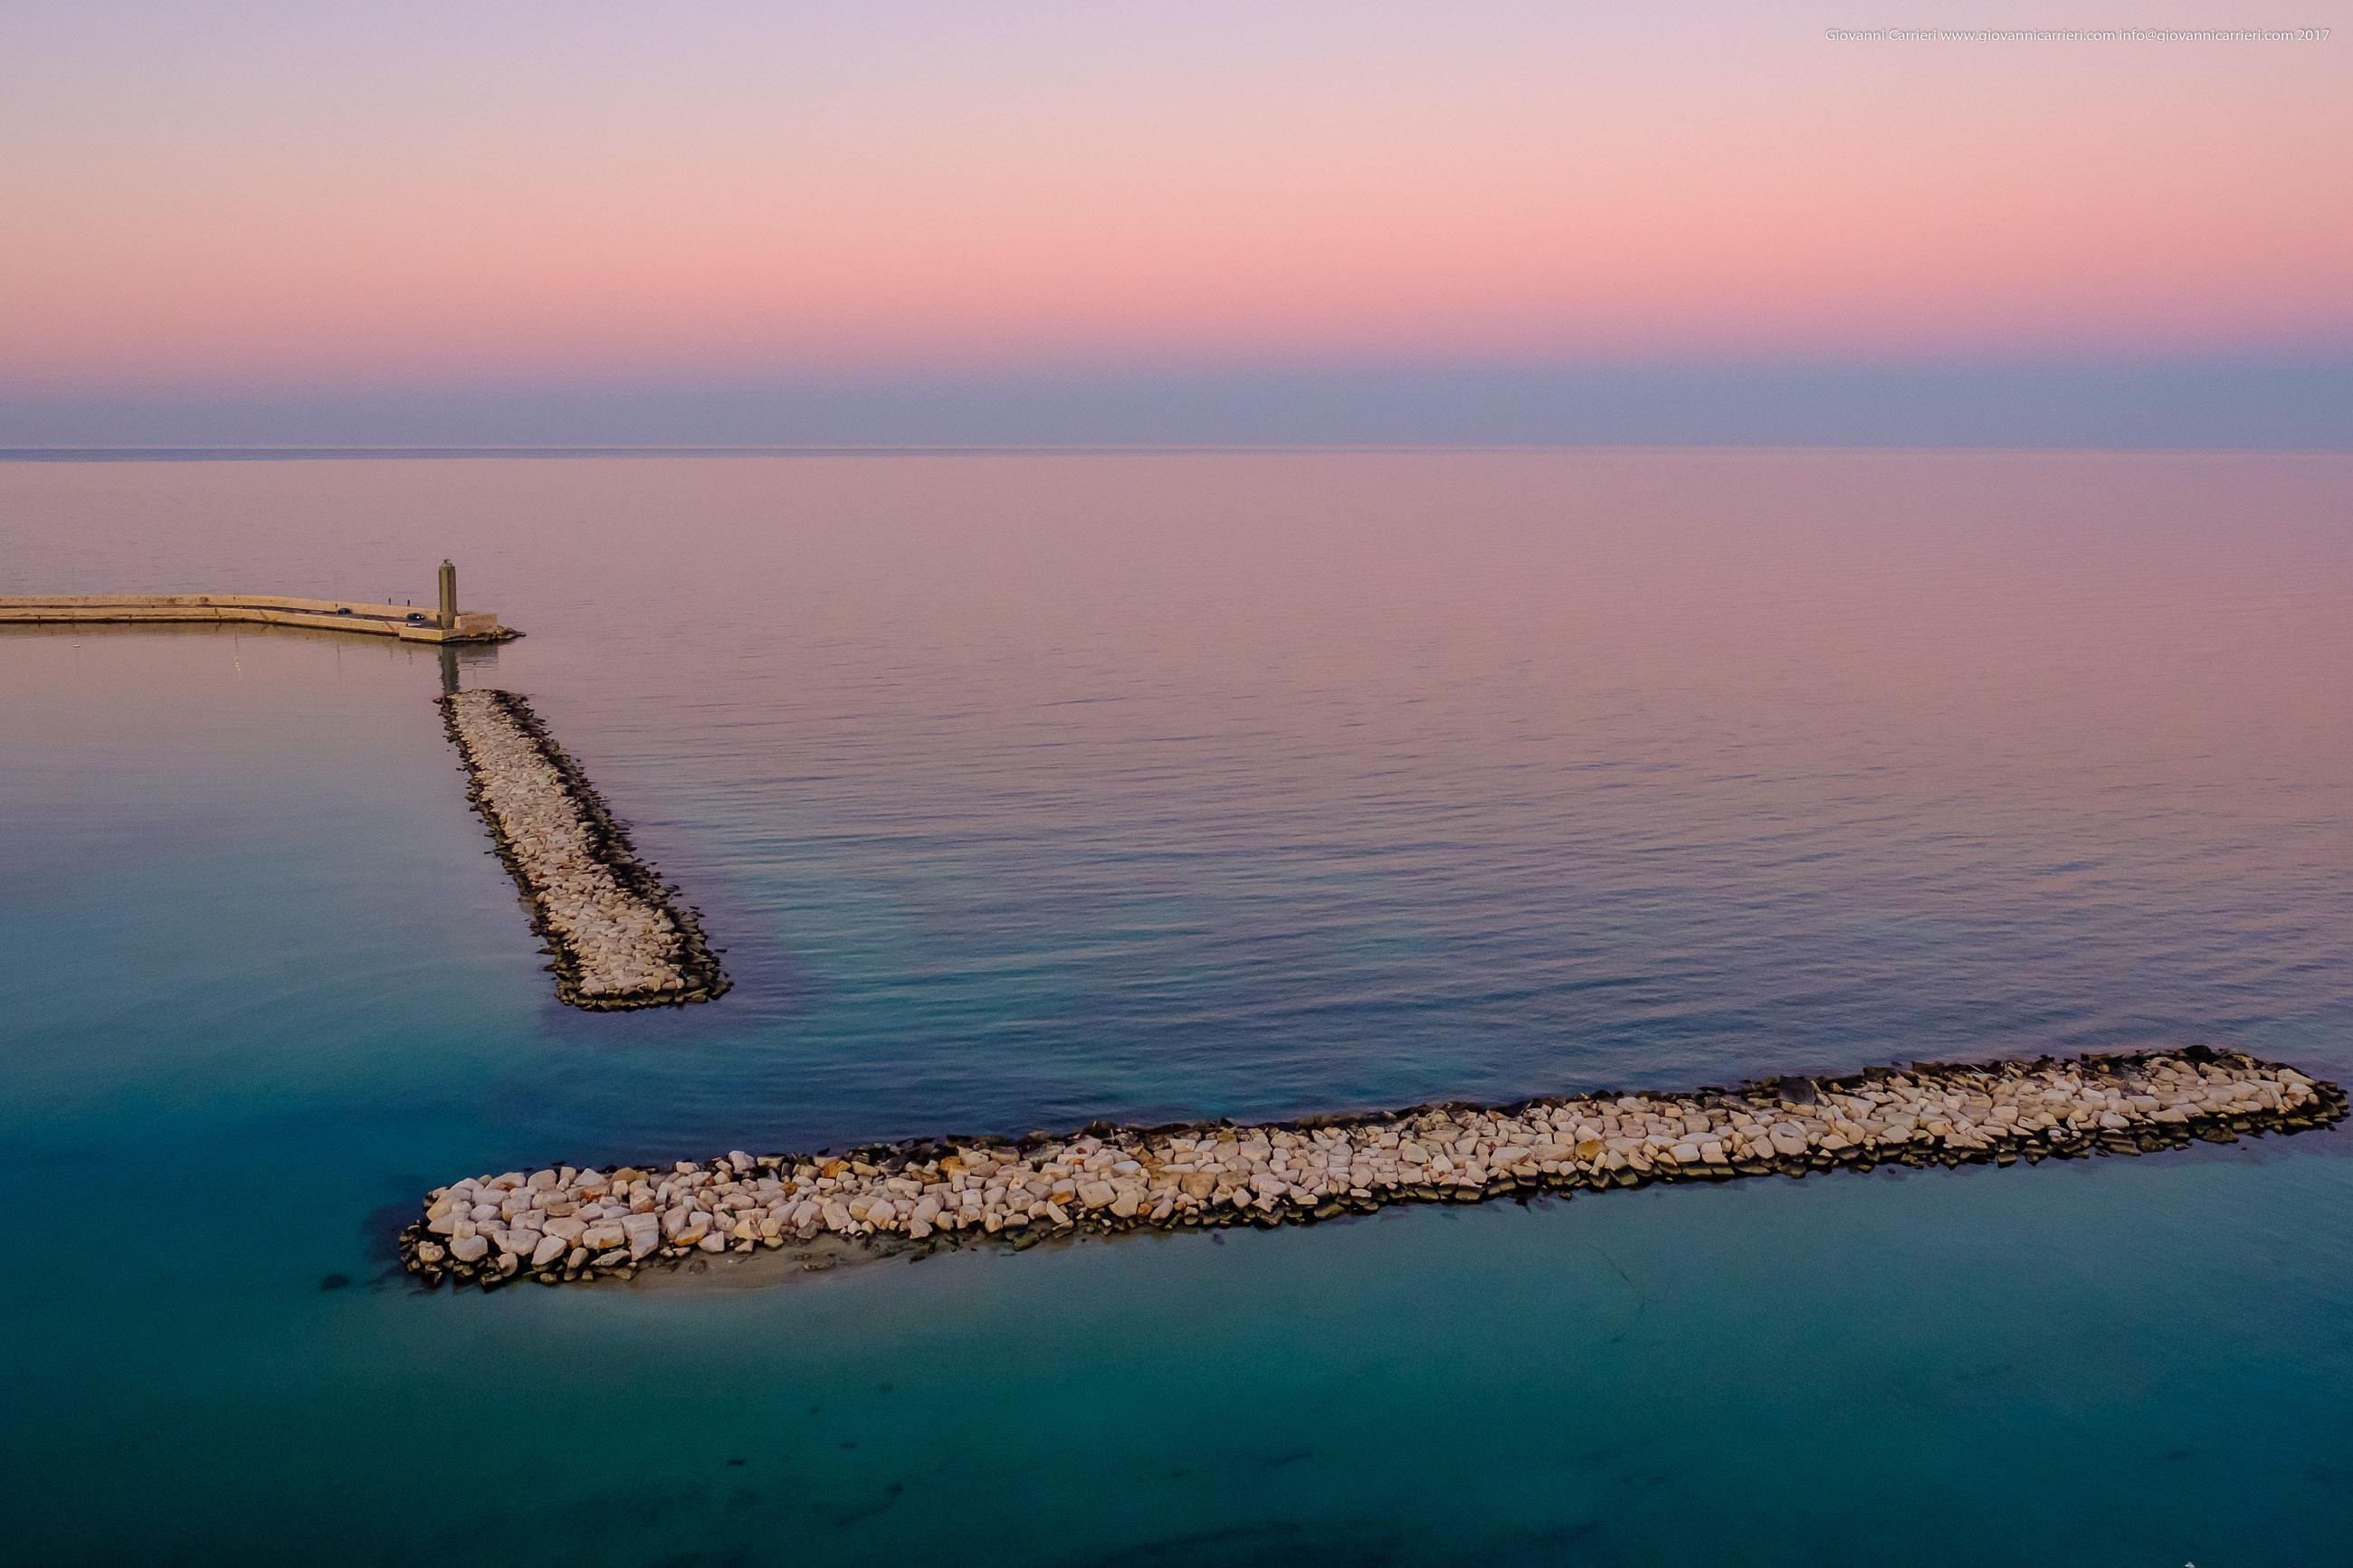 Bari seaport entrance